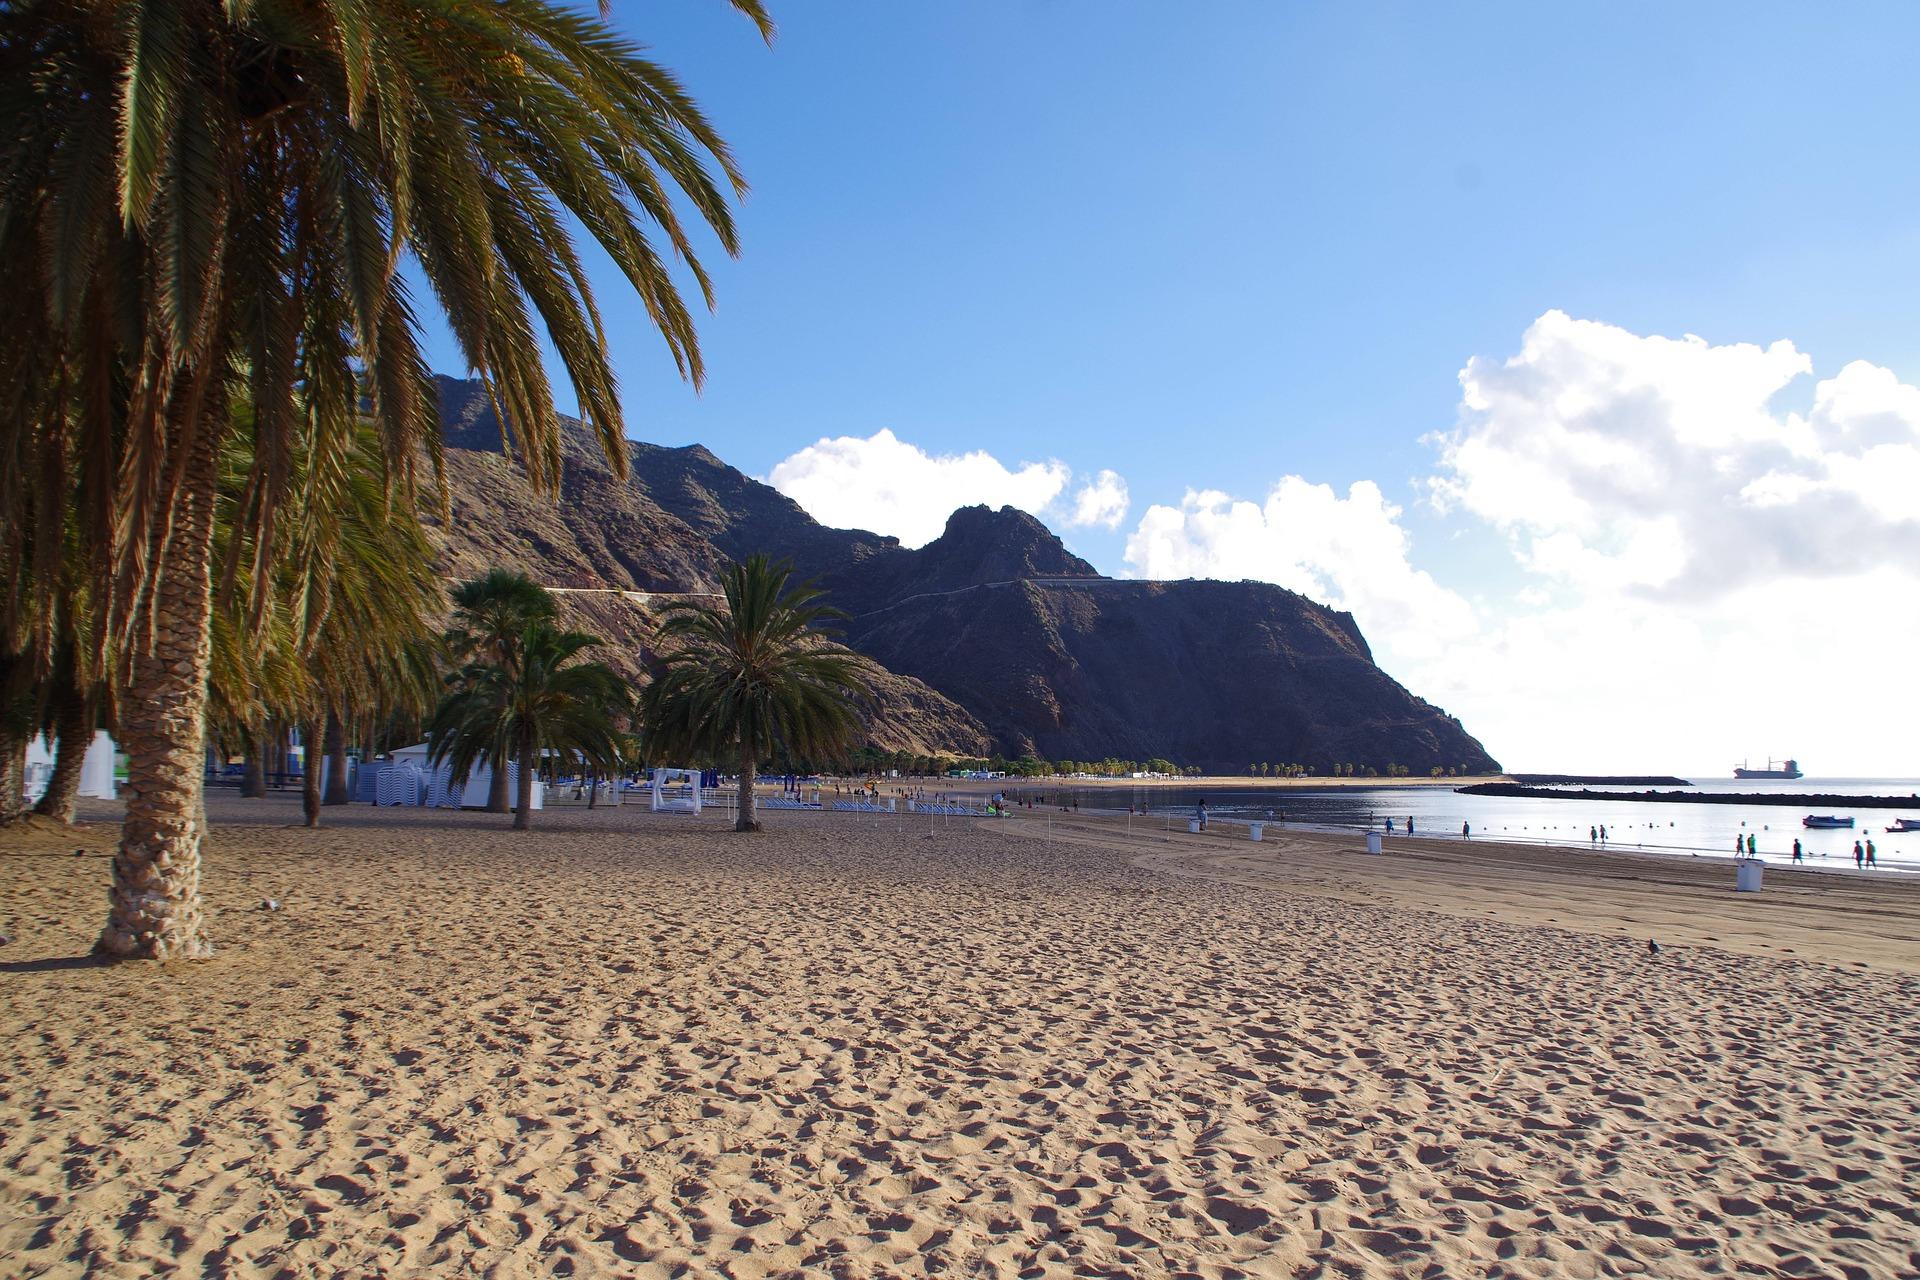 Kurzurlaub auf Teneriffa 3 Nächte günstig ab 43,00€ Flug + Hotel Strand